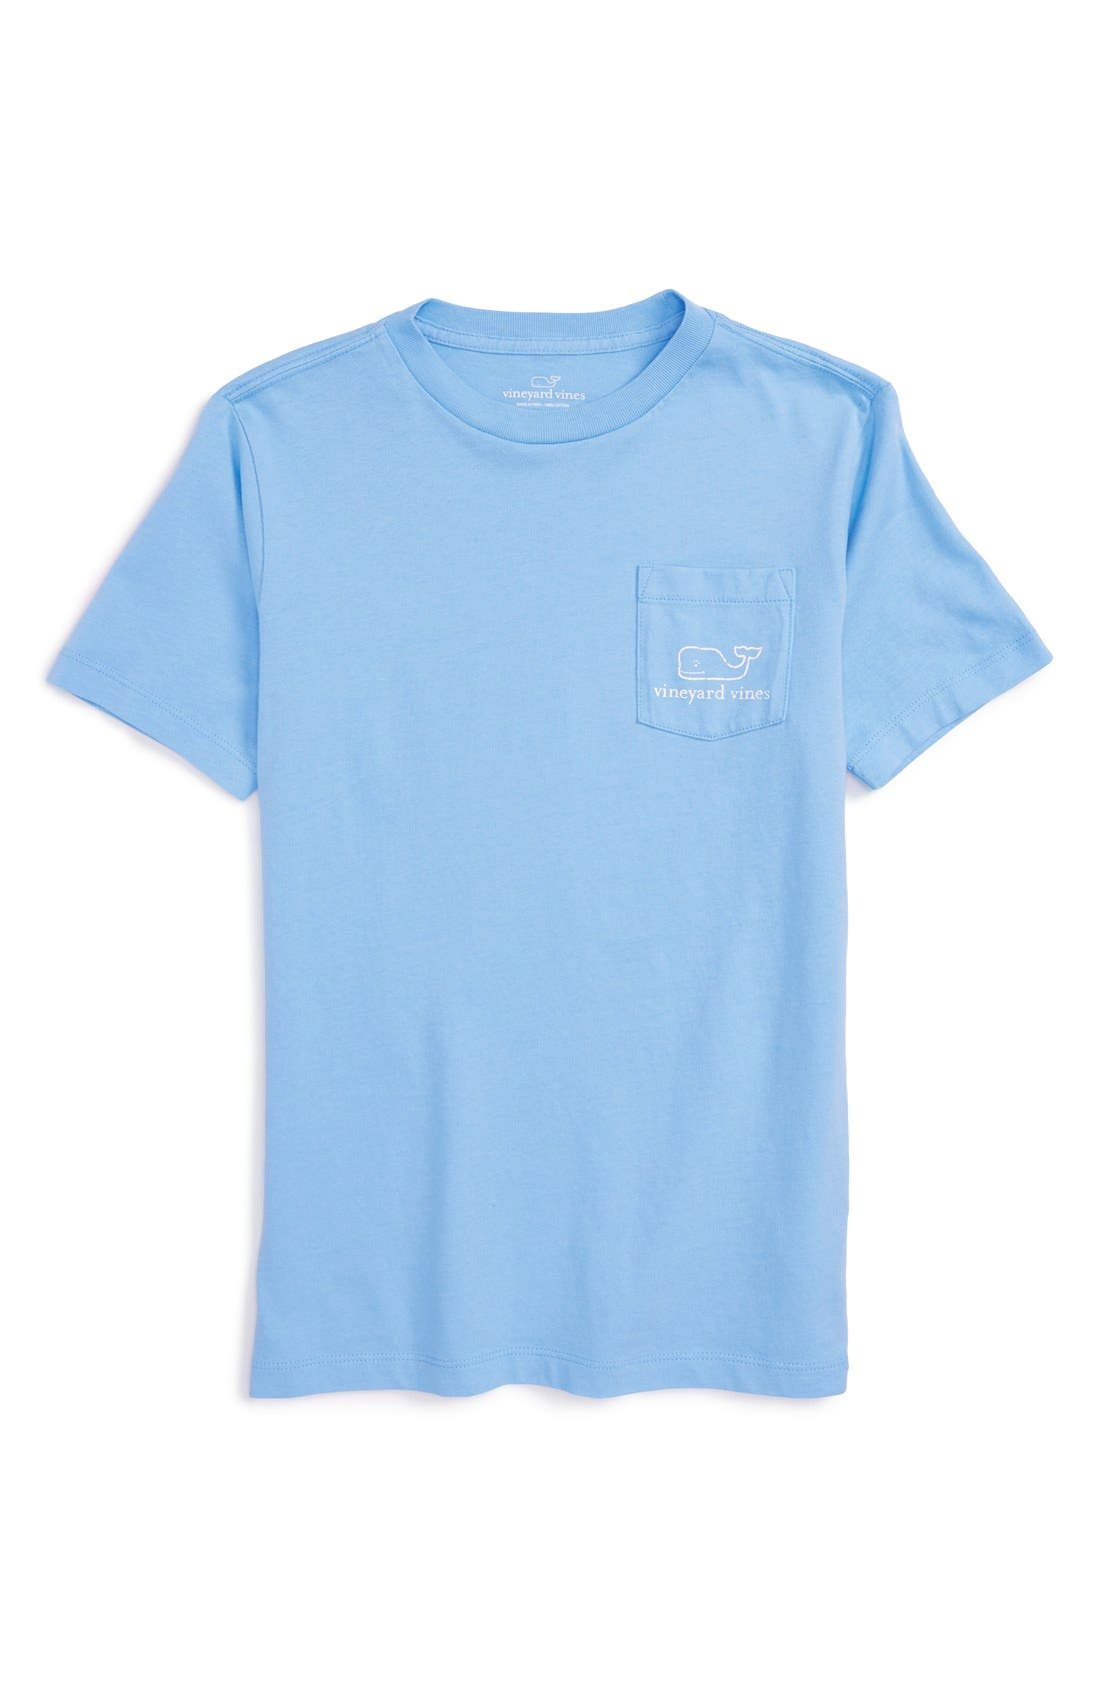 Alternate Image 1 Selected - vineyard vines Whale T-Shirt (Big Boys)